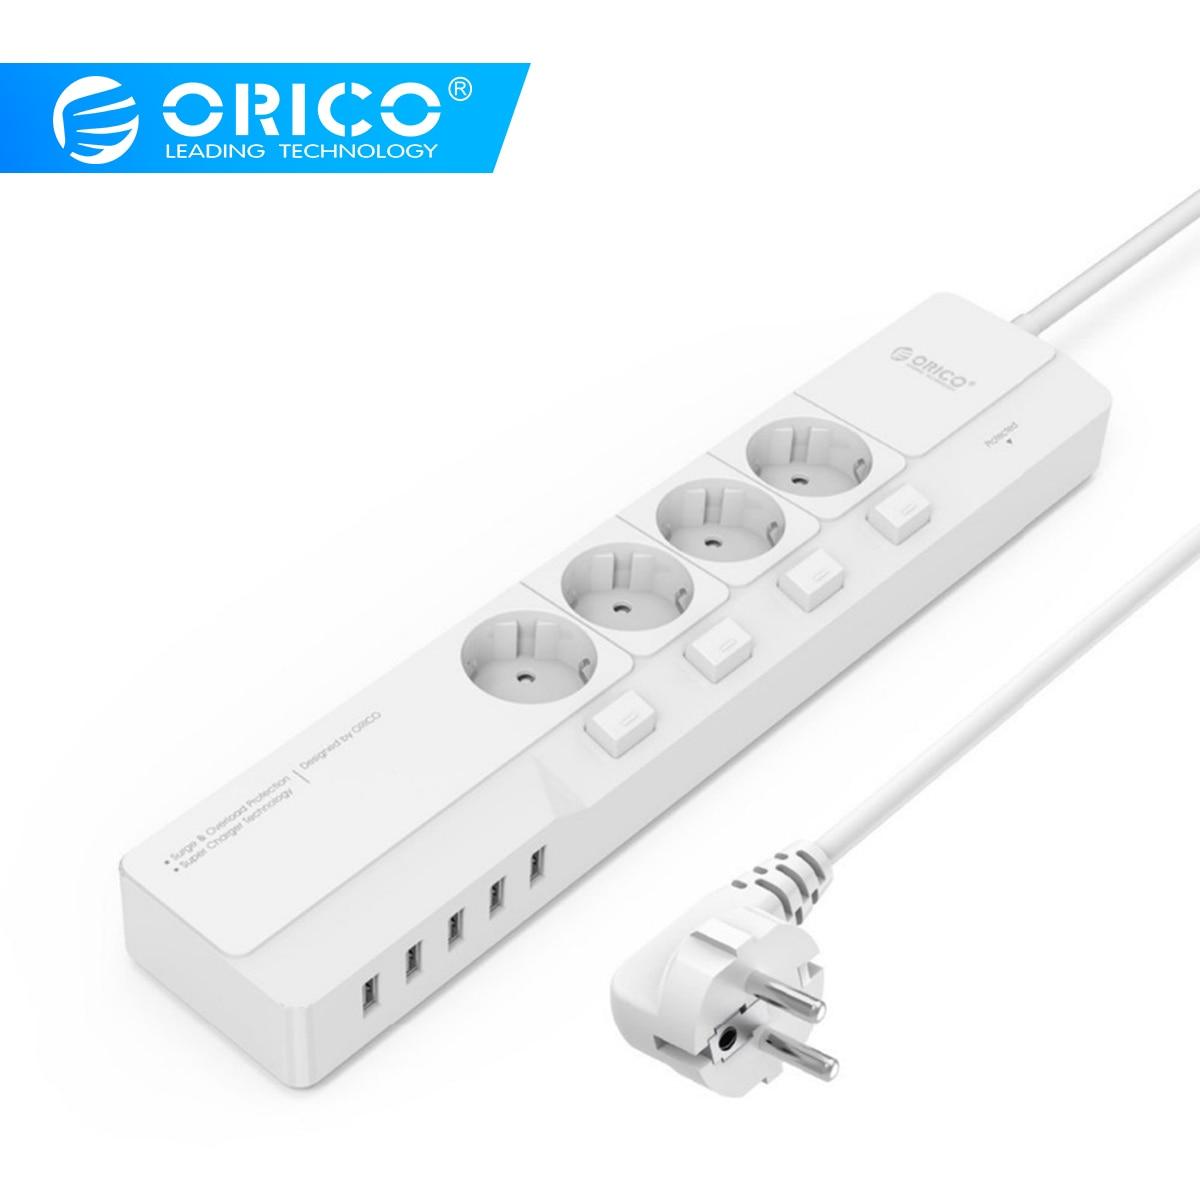 ORICO Smart Socket 4 AC Outlet 5 USB Port Surge Protector Universal Adapter Travel Multi Plug